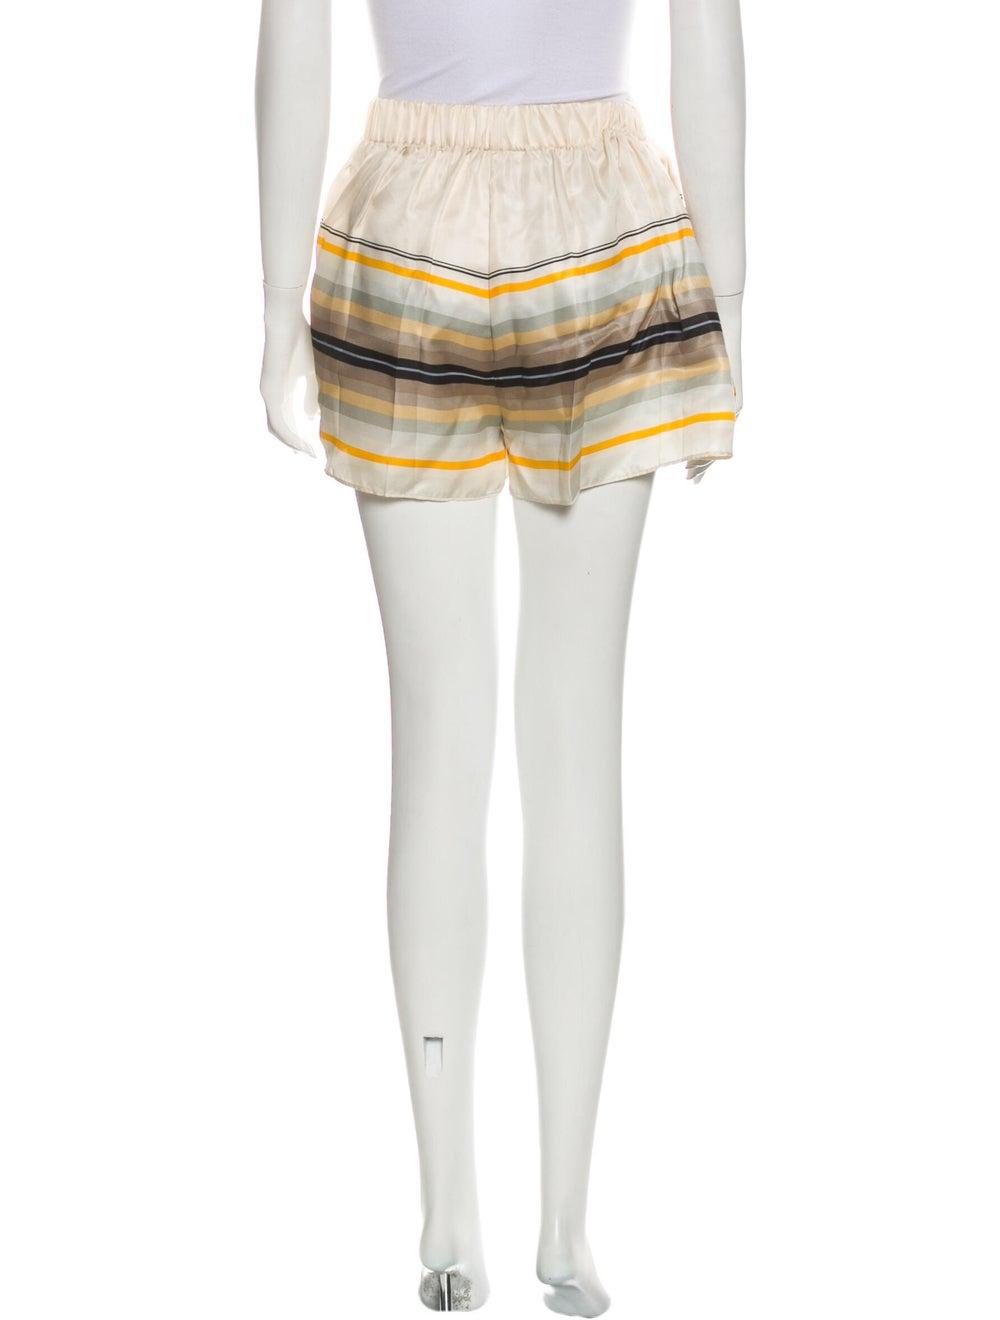 Rag & Bone Silk Mini Shorts - image 3